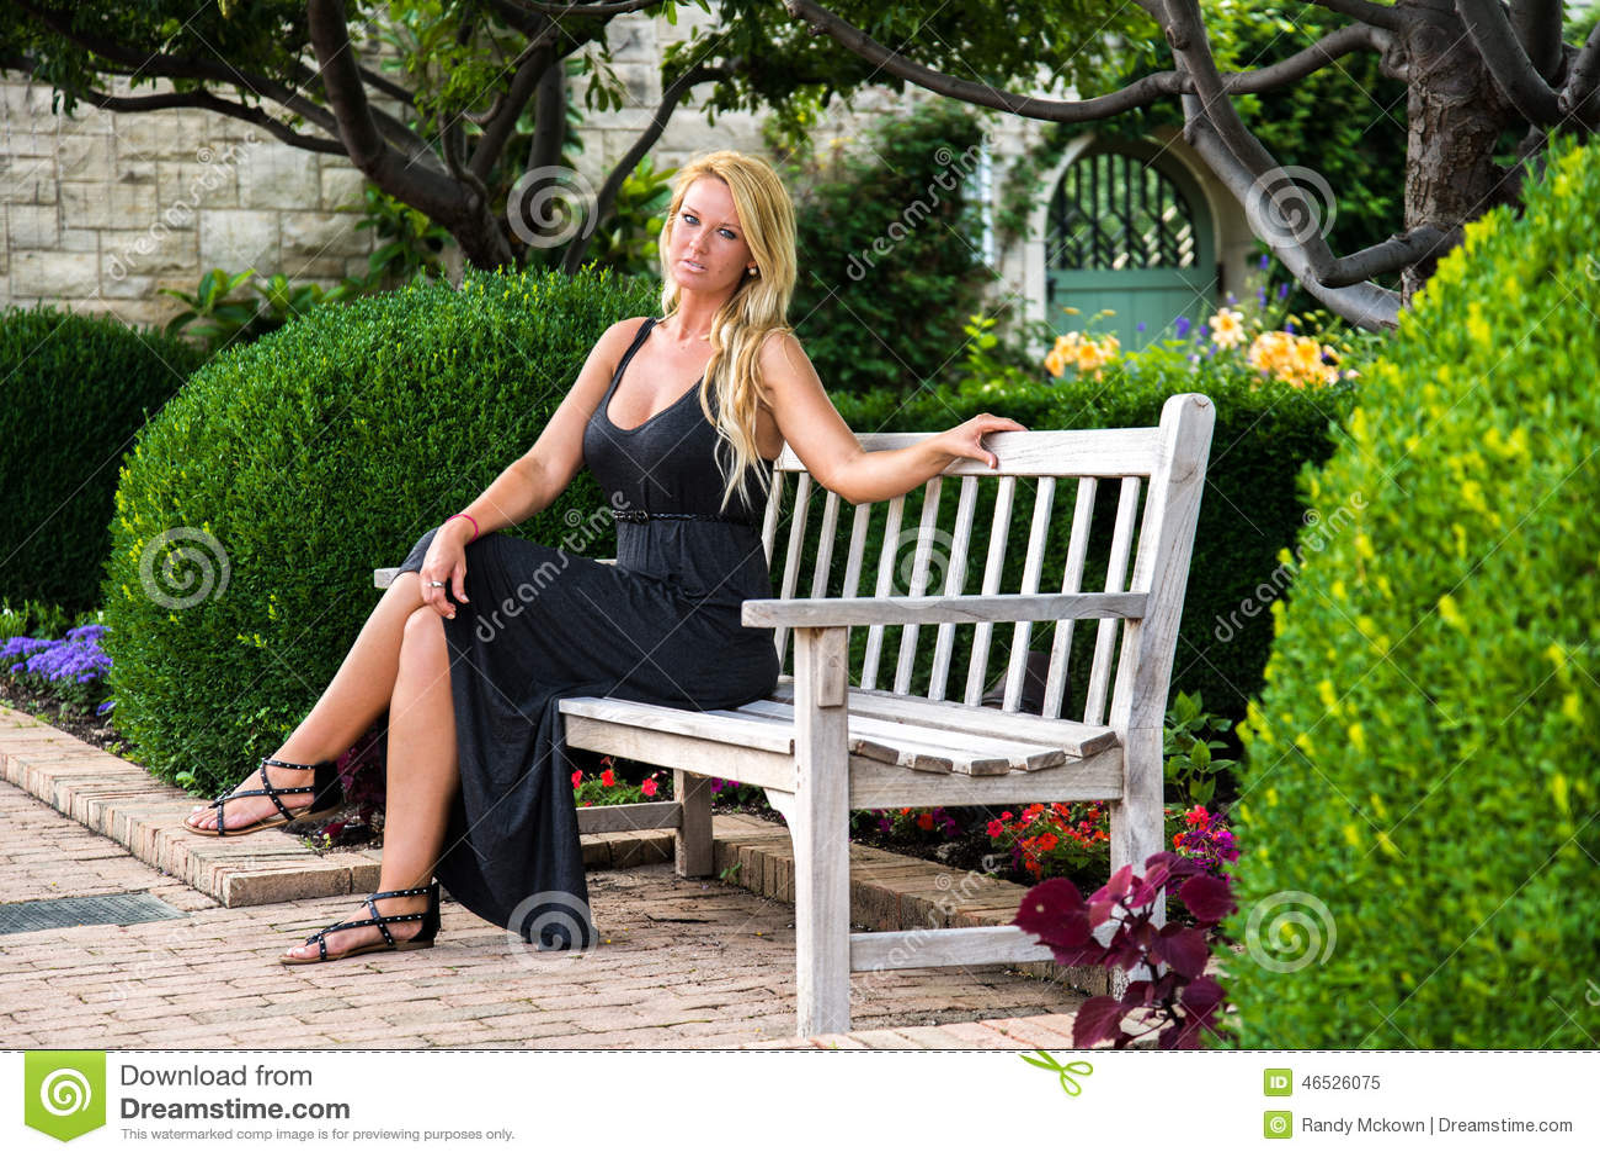 Blonde Woman Sitting On Bench Fashion Stock Image Image